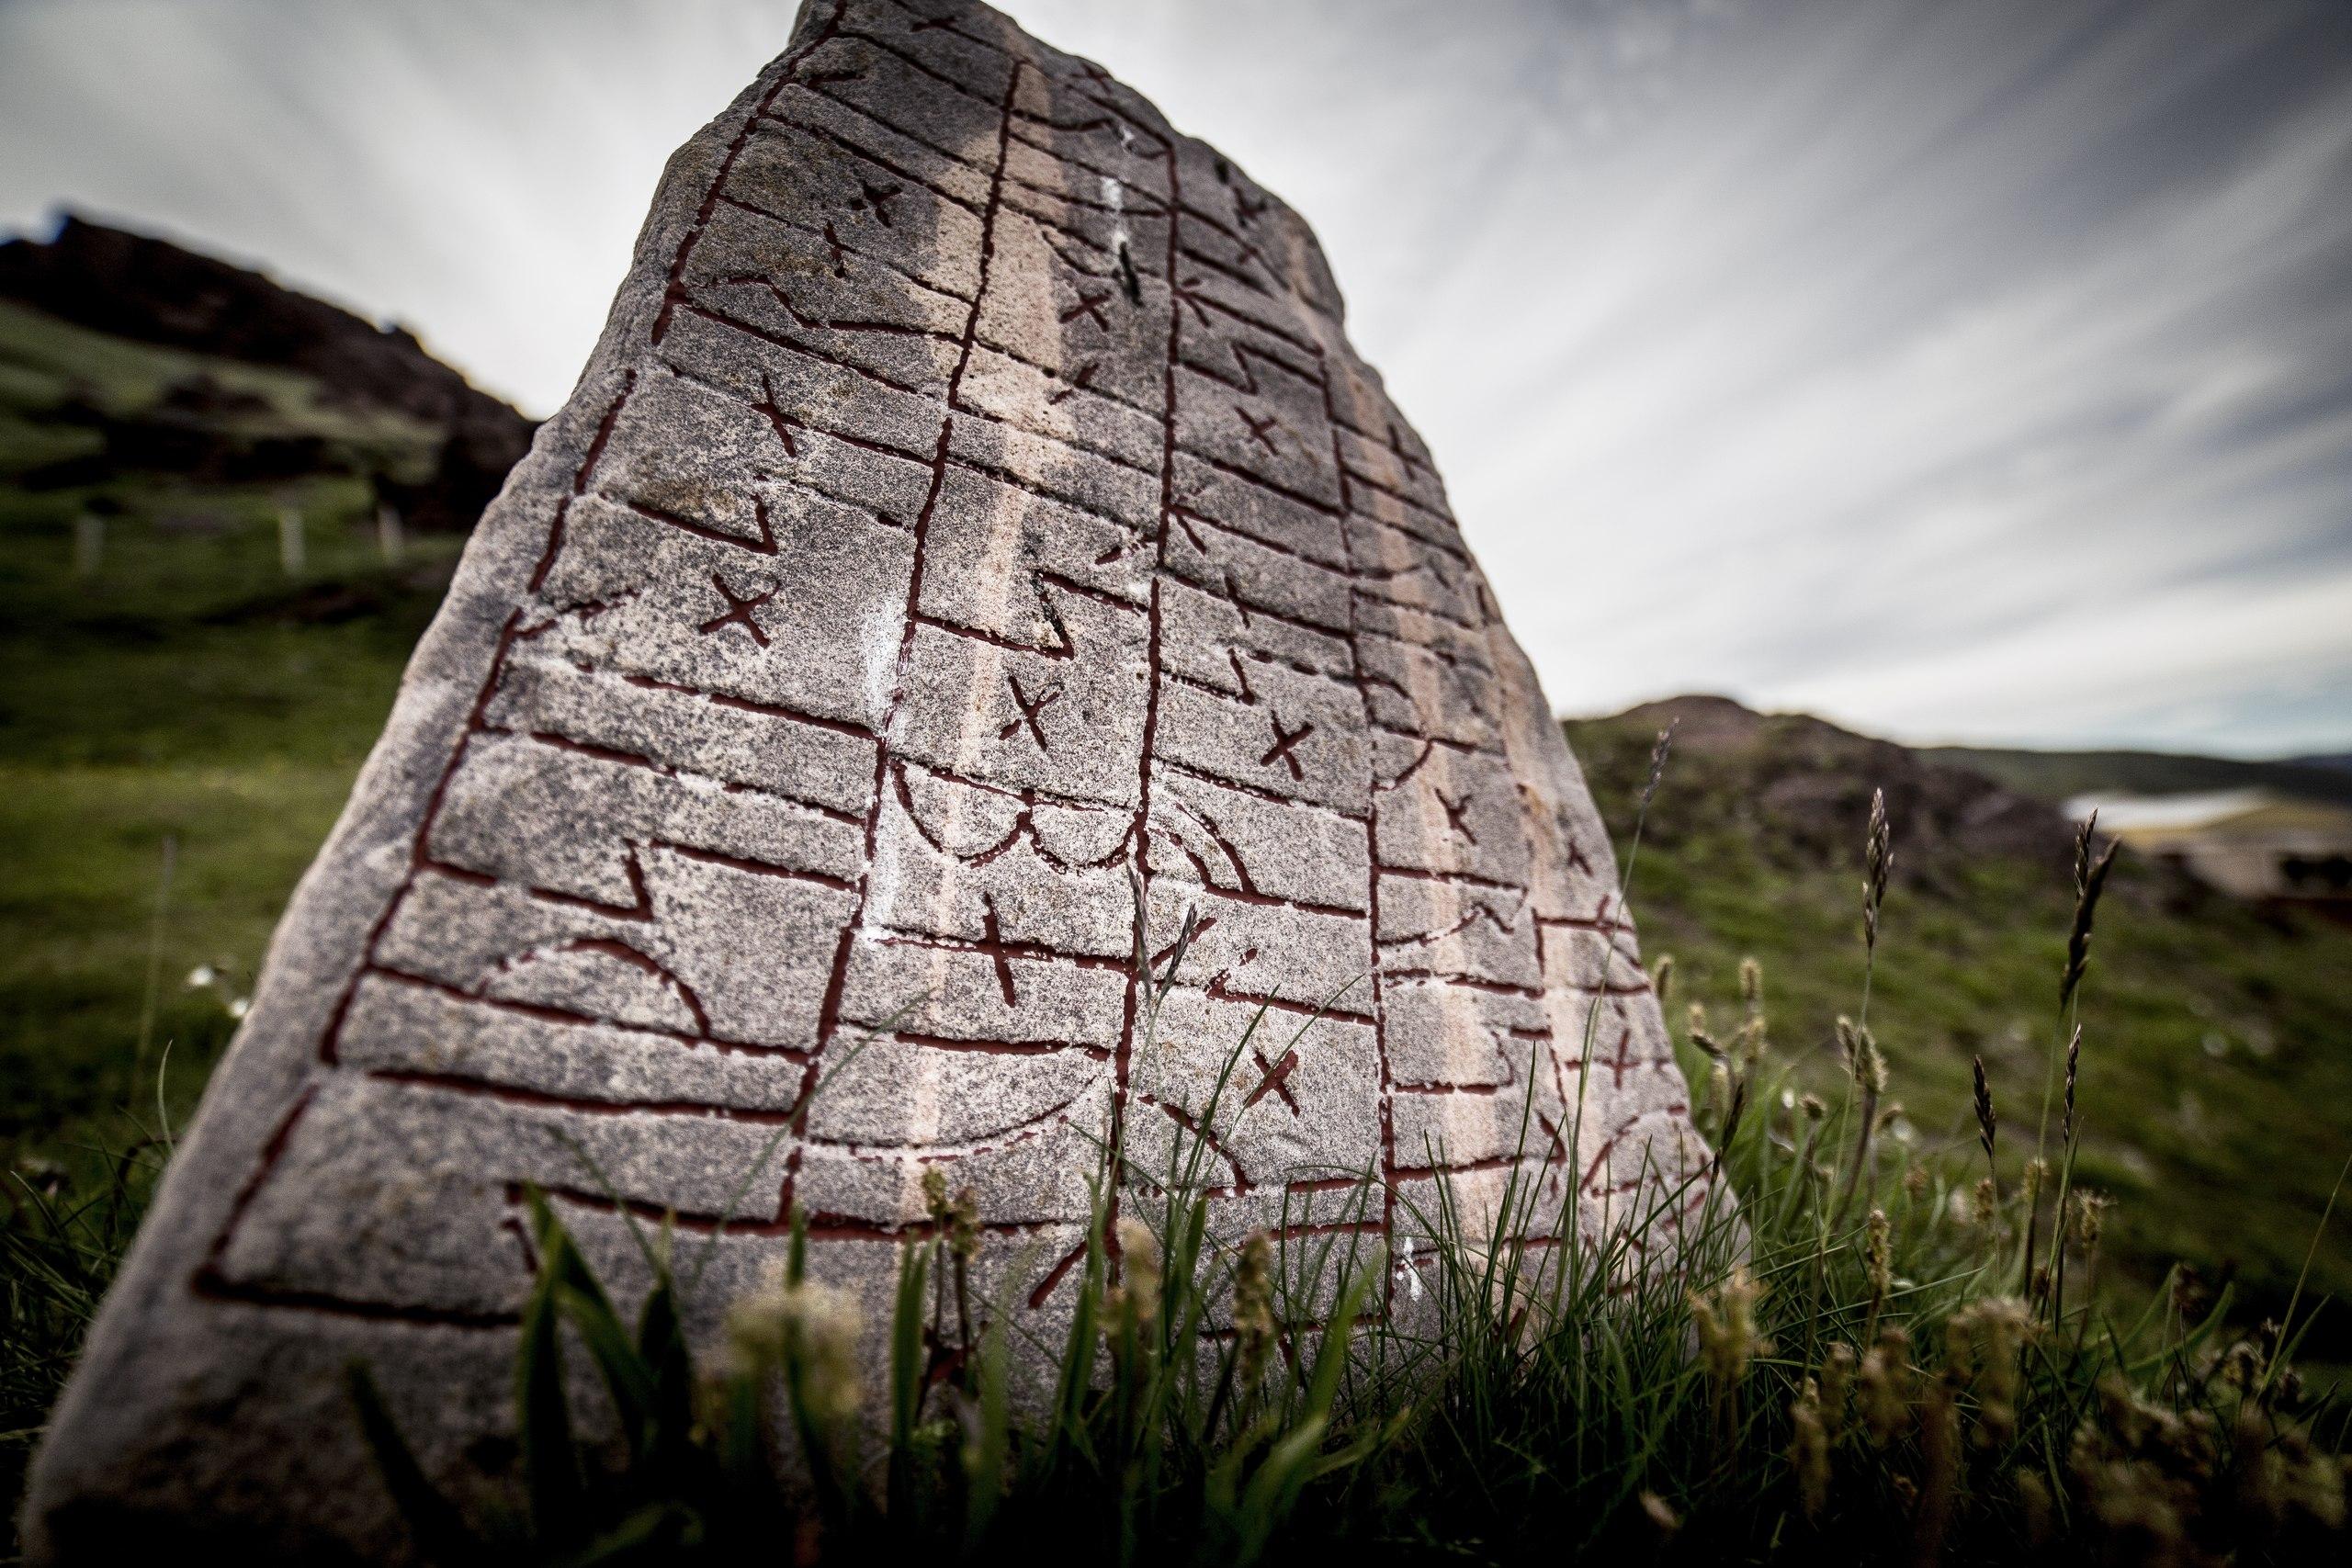 General 2560x1707 nature viking runes Scandinavia low-angle